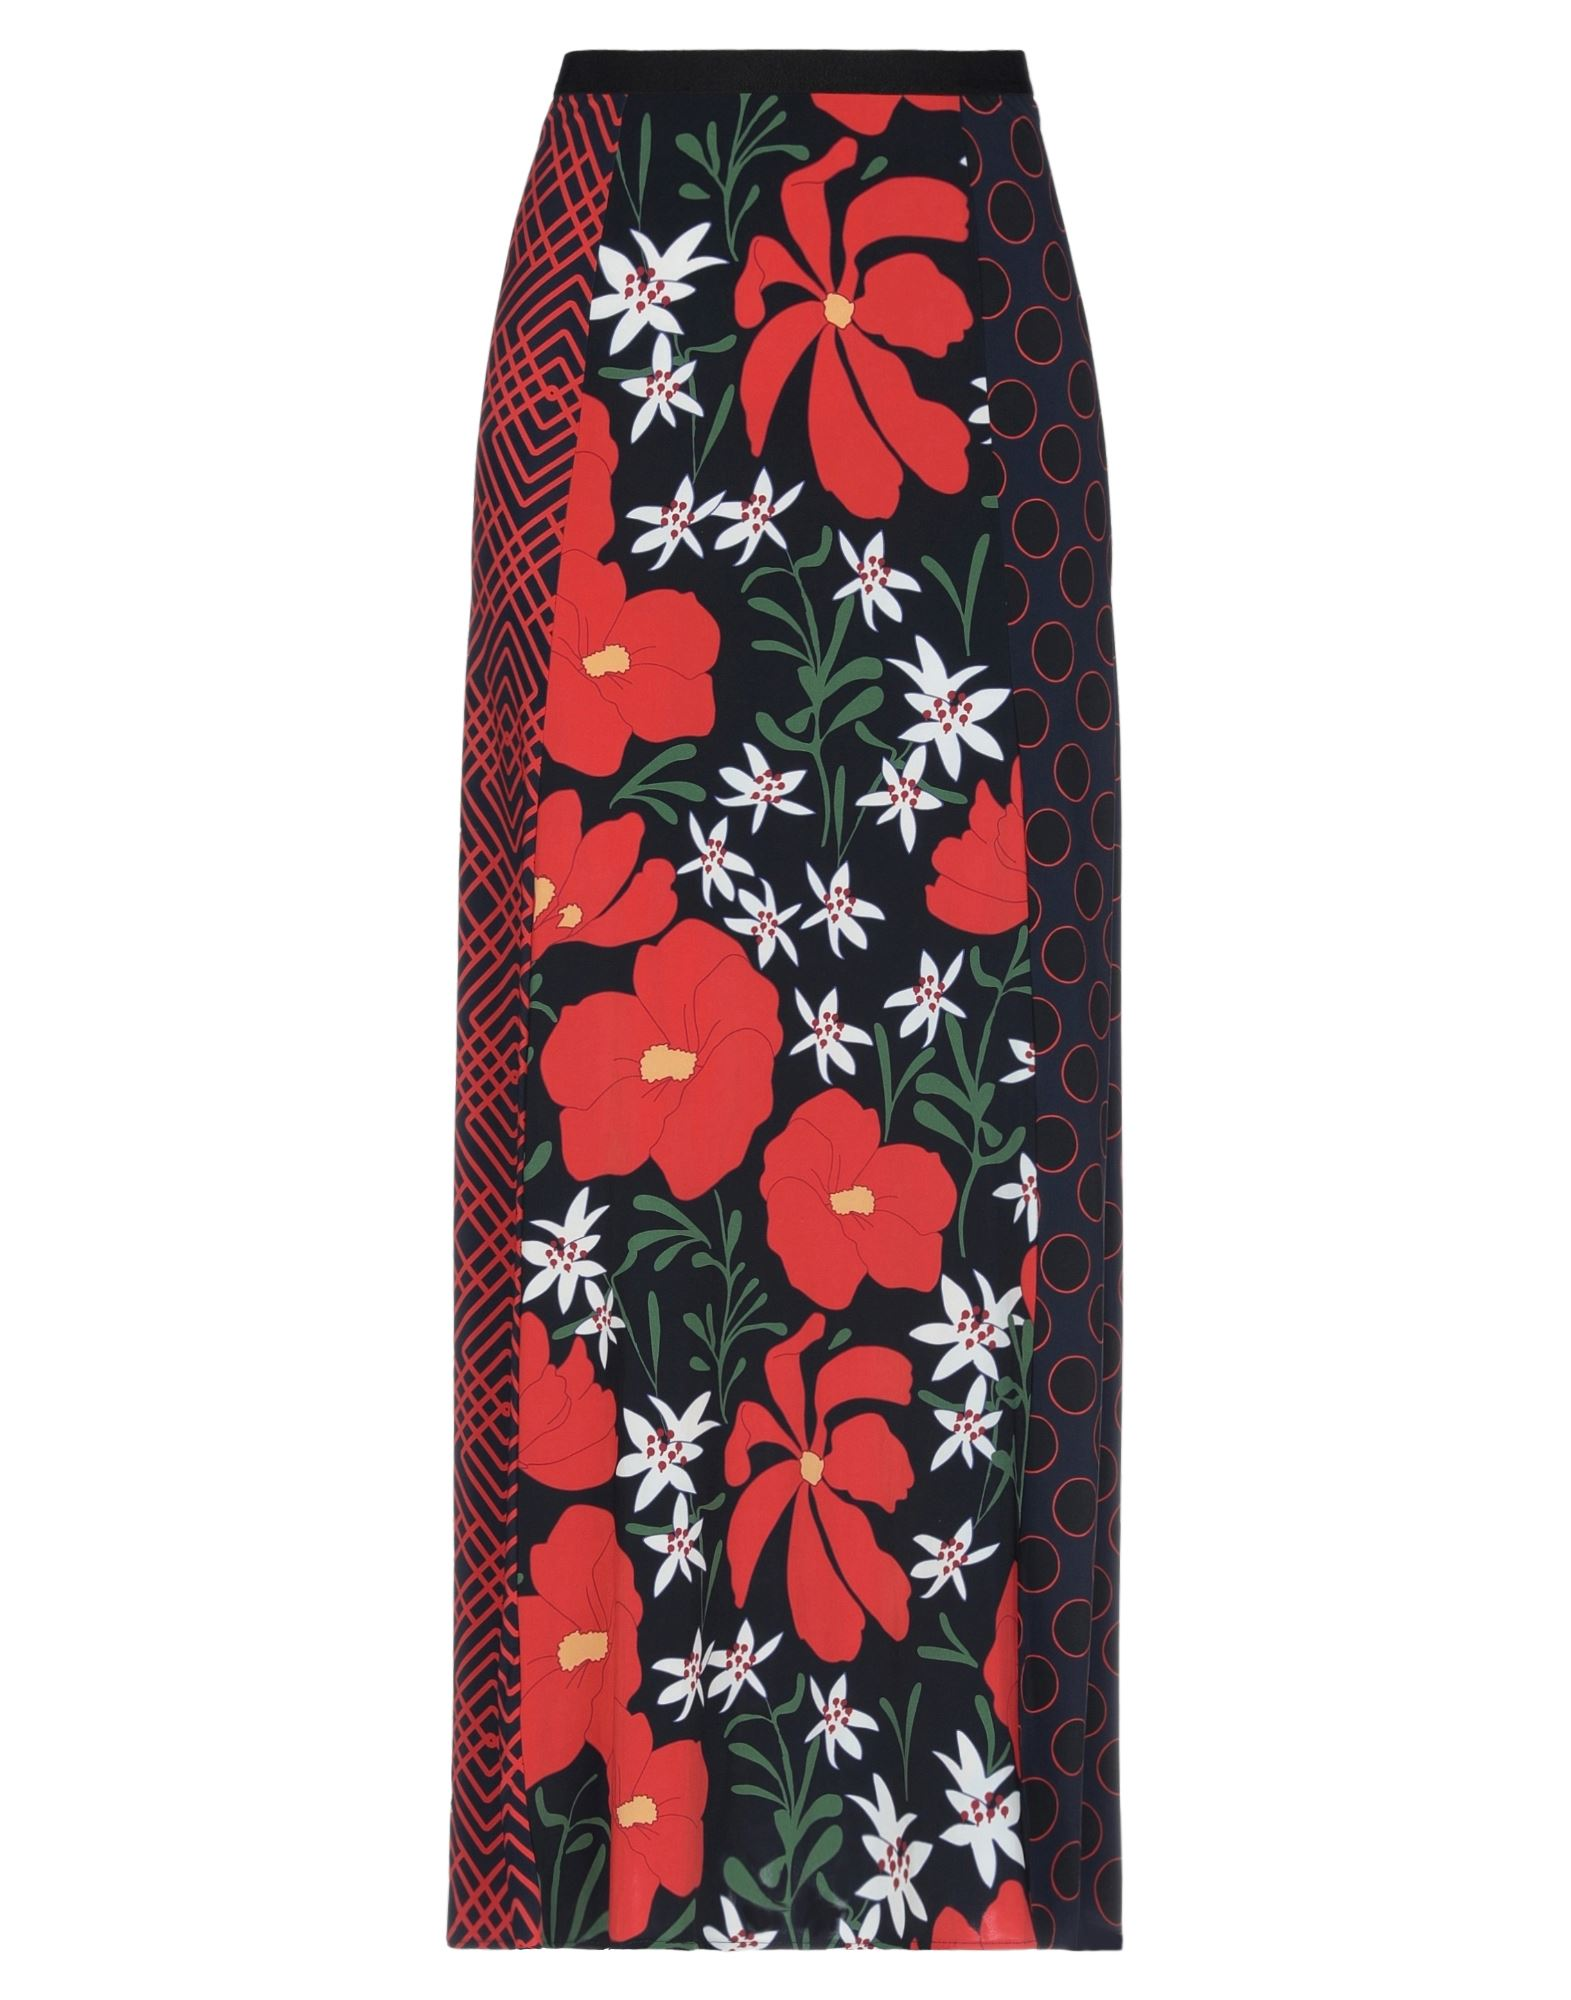 sun 68 длинная юбка SIYU Длинная юбка